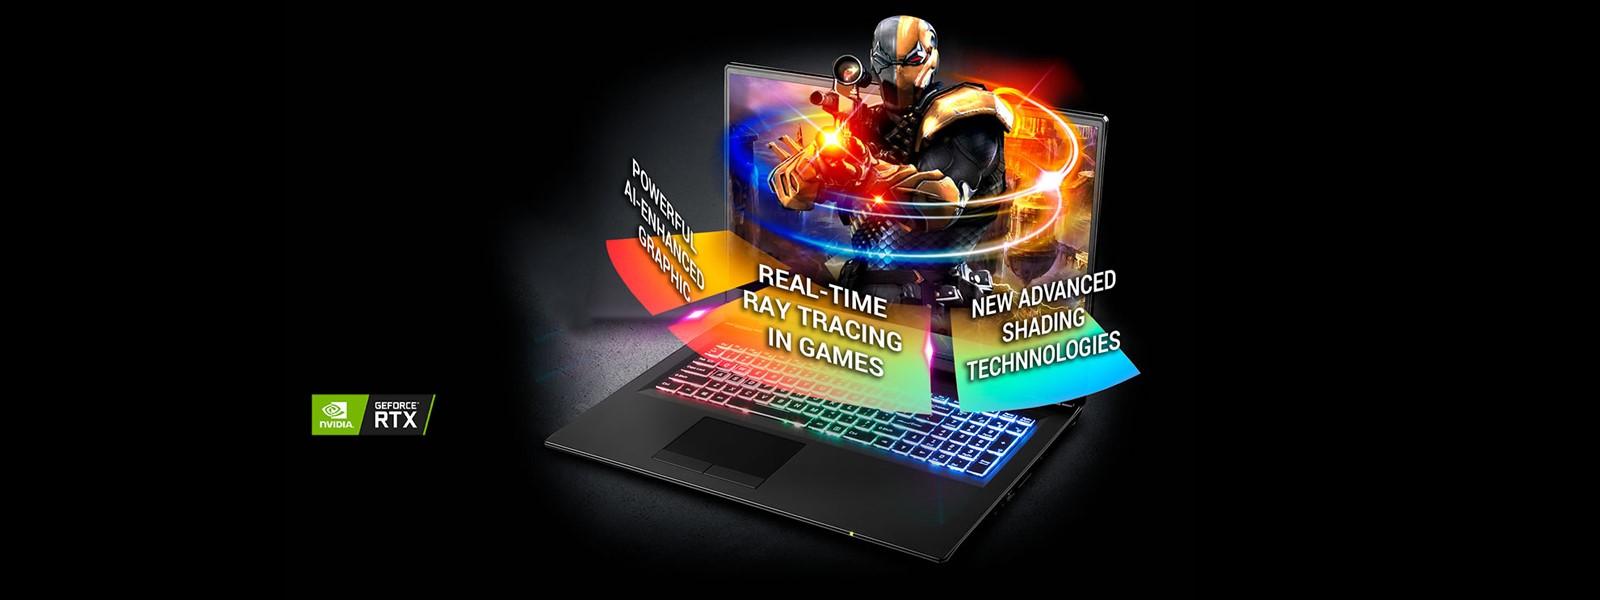 CLEVO P970RN Intel Core i7-9750H | Metal Chassis | NVIDIA RTX 2080